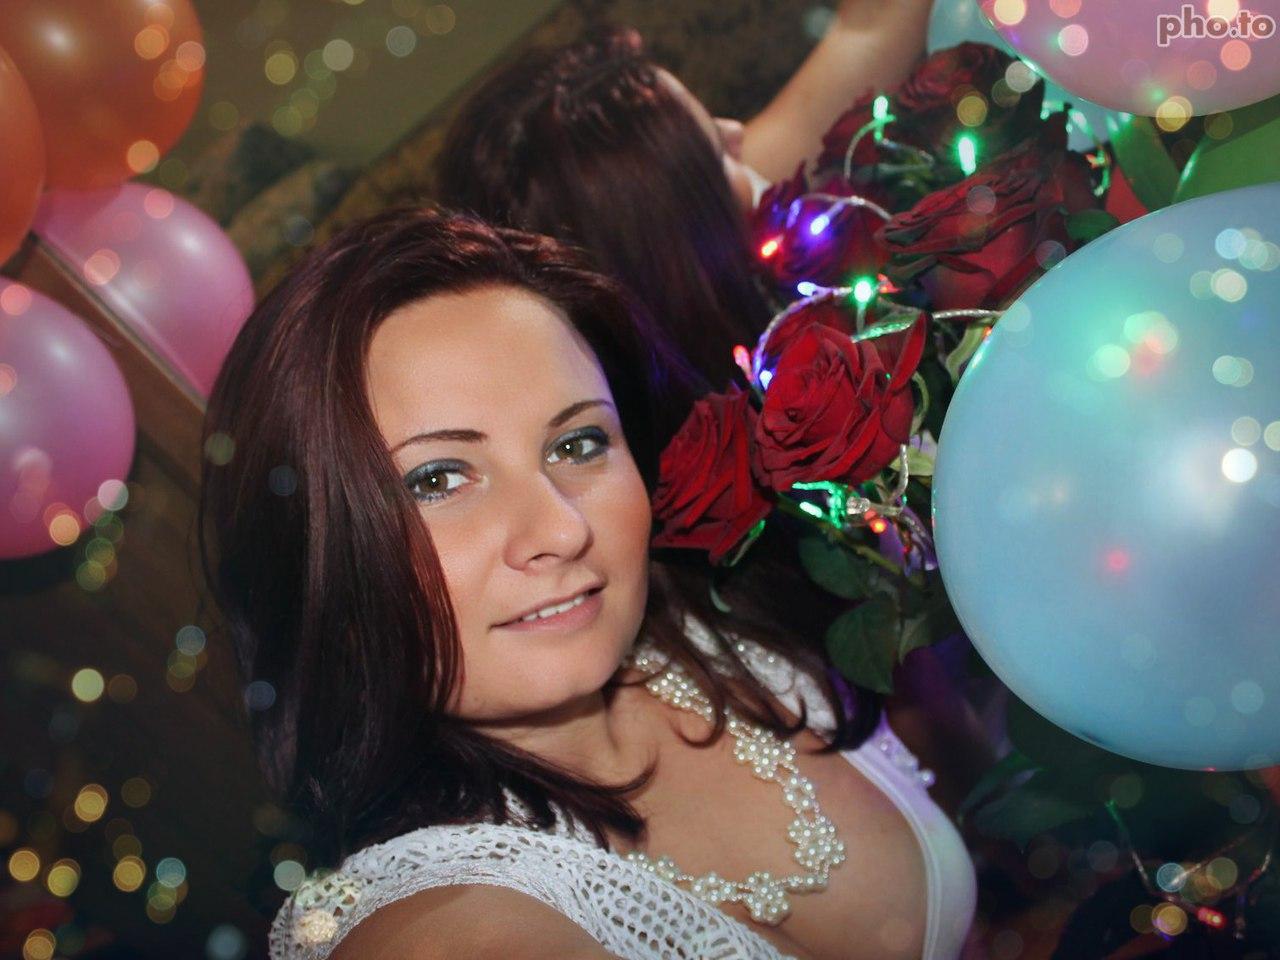 Лолли Твердаева, Одесса - фото №14